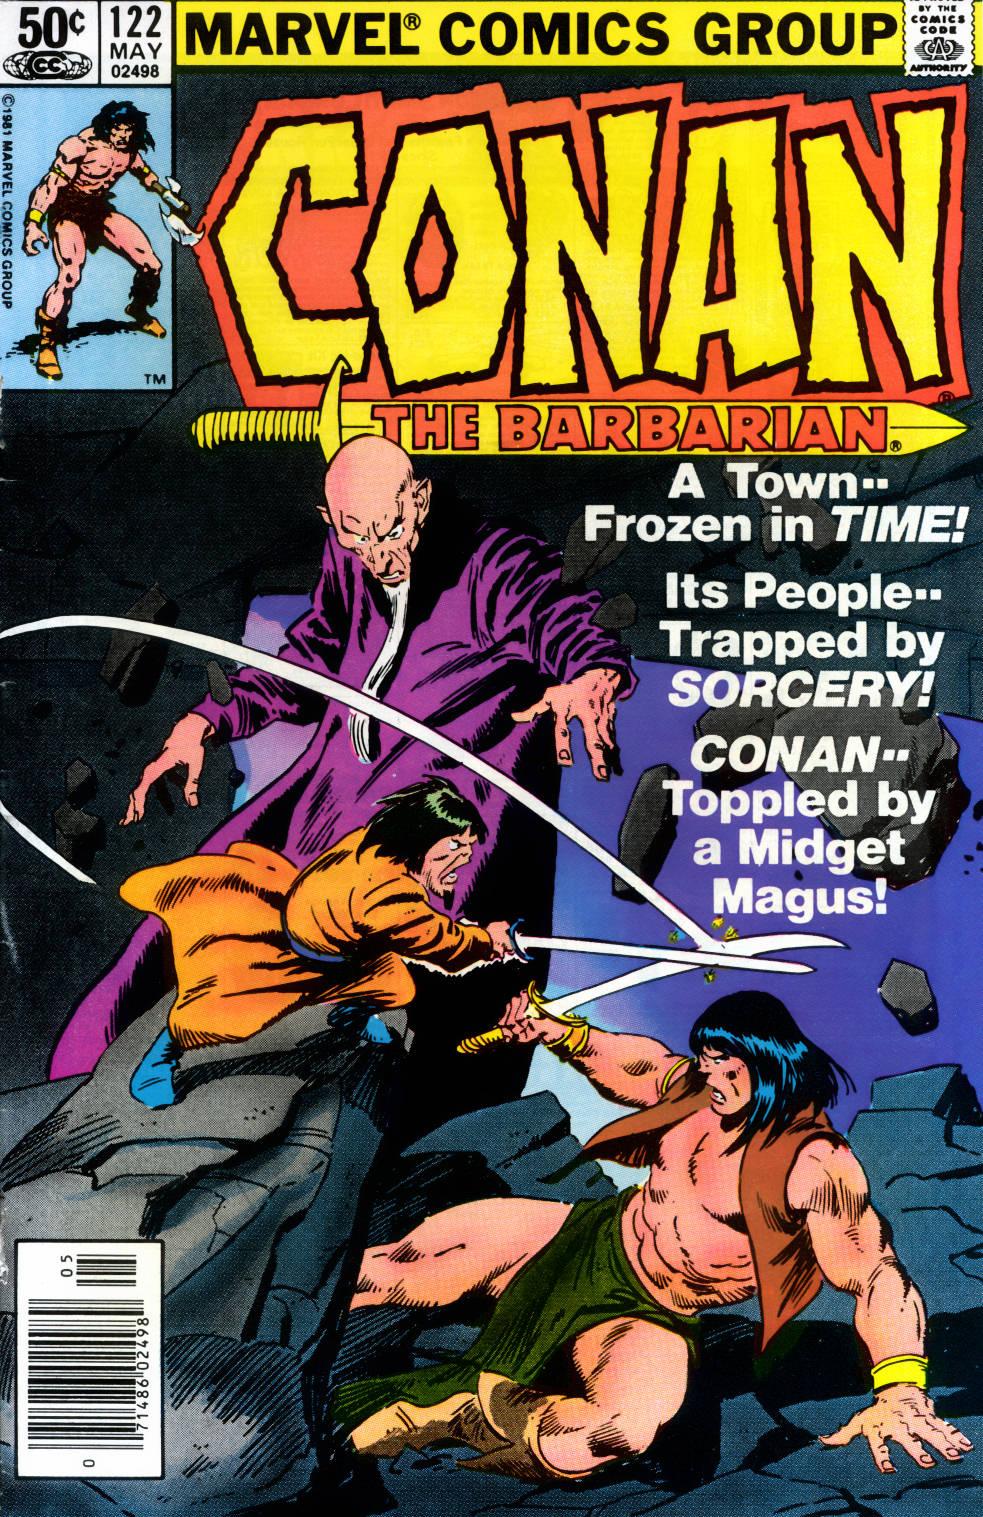 Conan the Barbarian (1970) Issue #122 #134 - English 1